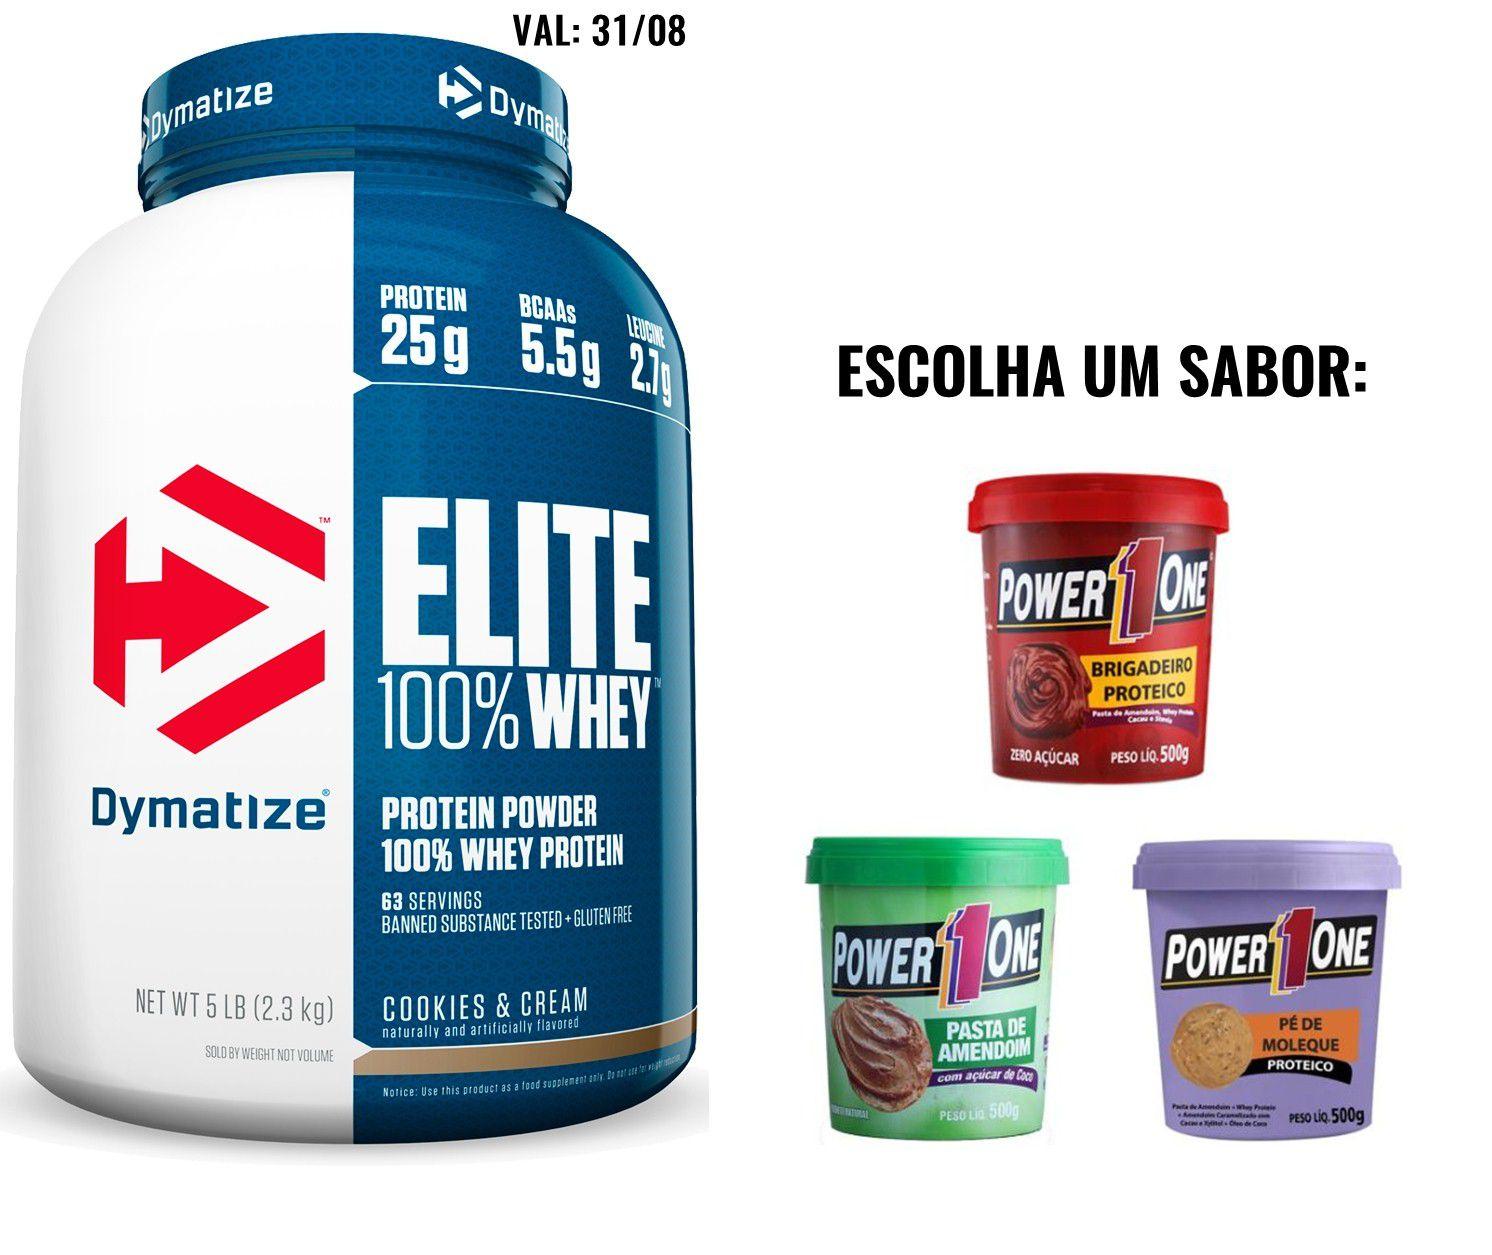 Elite 100% Whey 5lbs (2270g) - Dymatize - (Val: 31/12) + 1x Pasta Proteica 500g - PowerOne